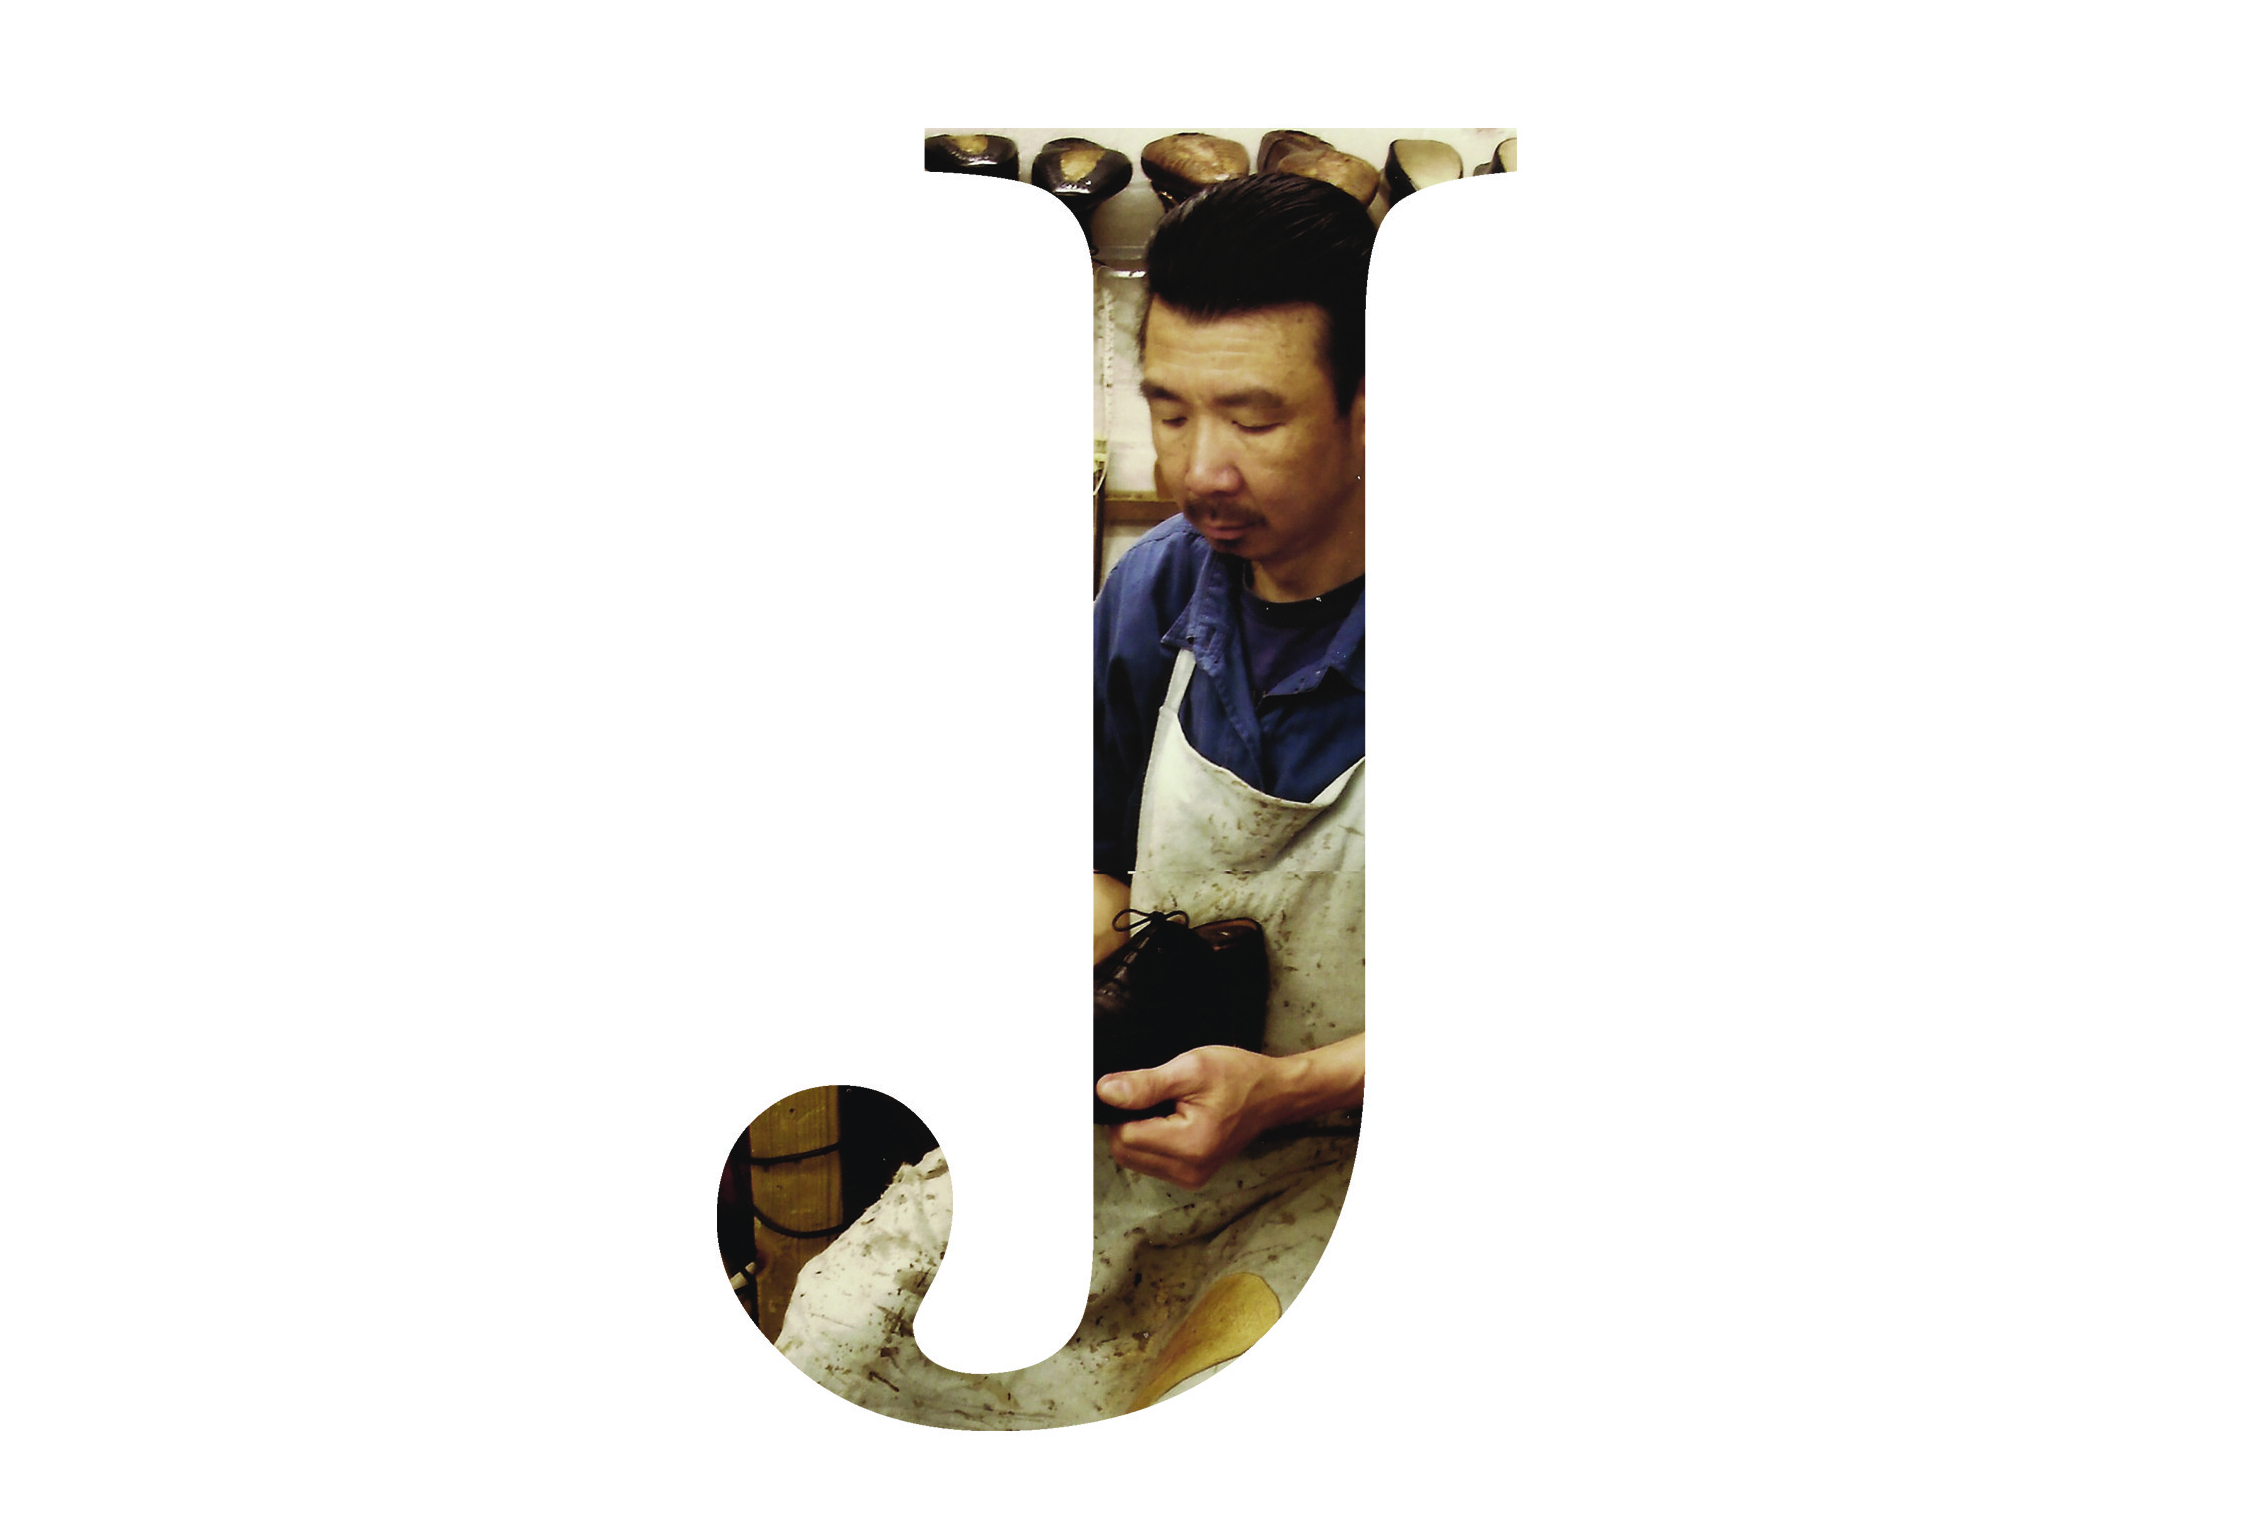 Joe Tan by Amy gilchrist